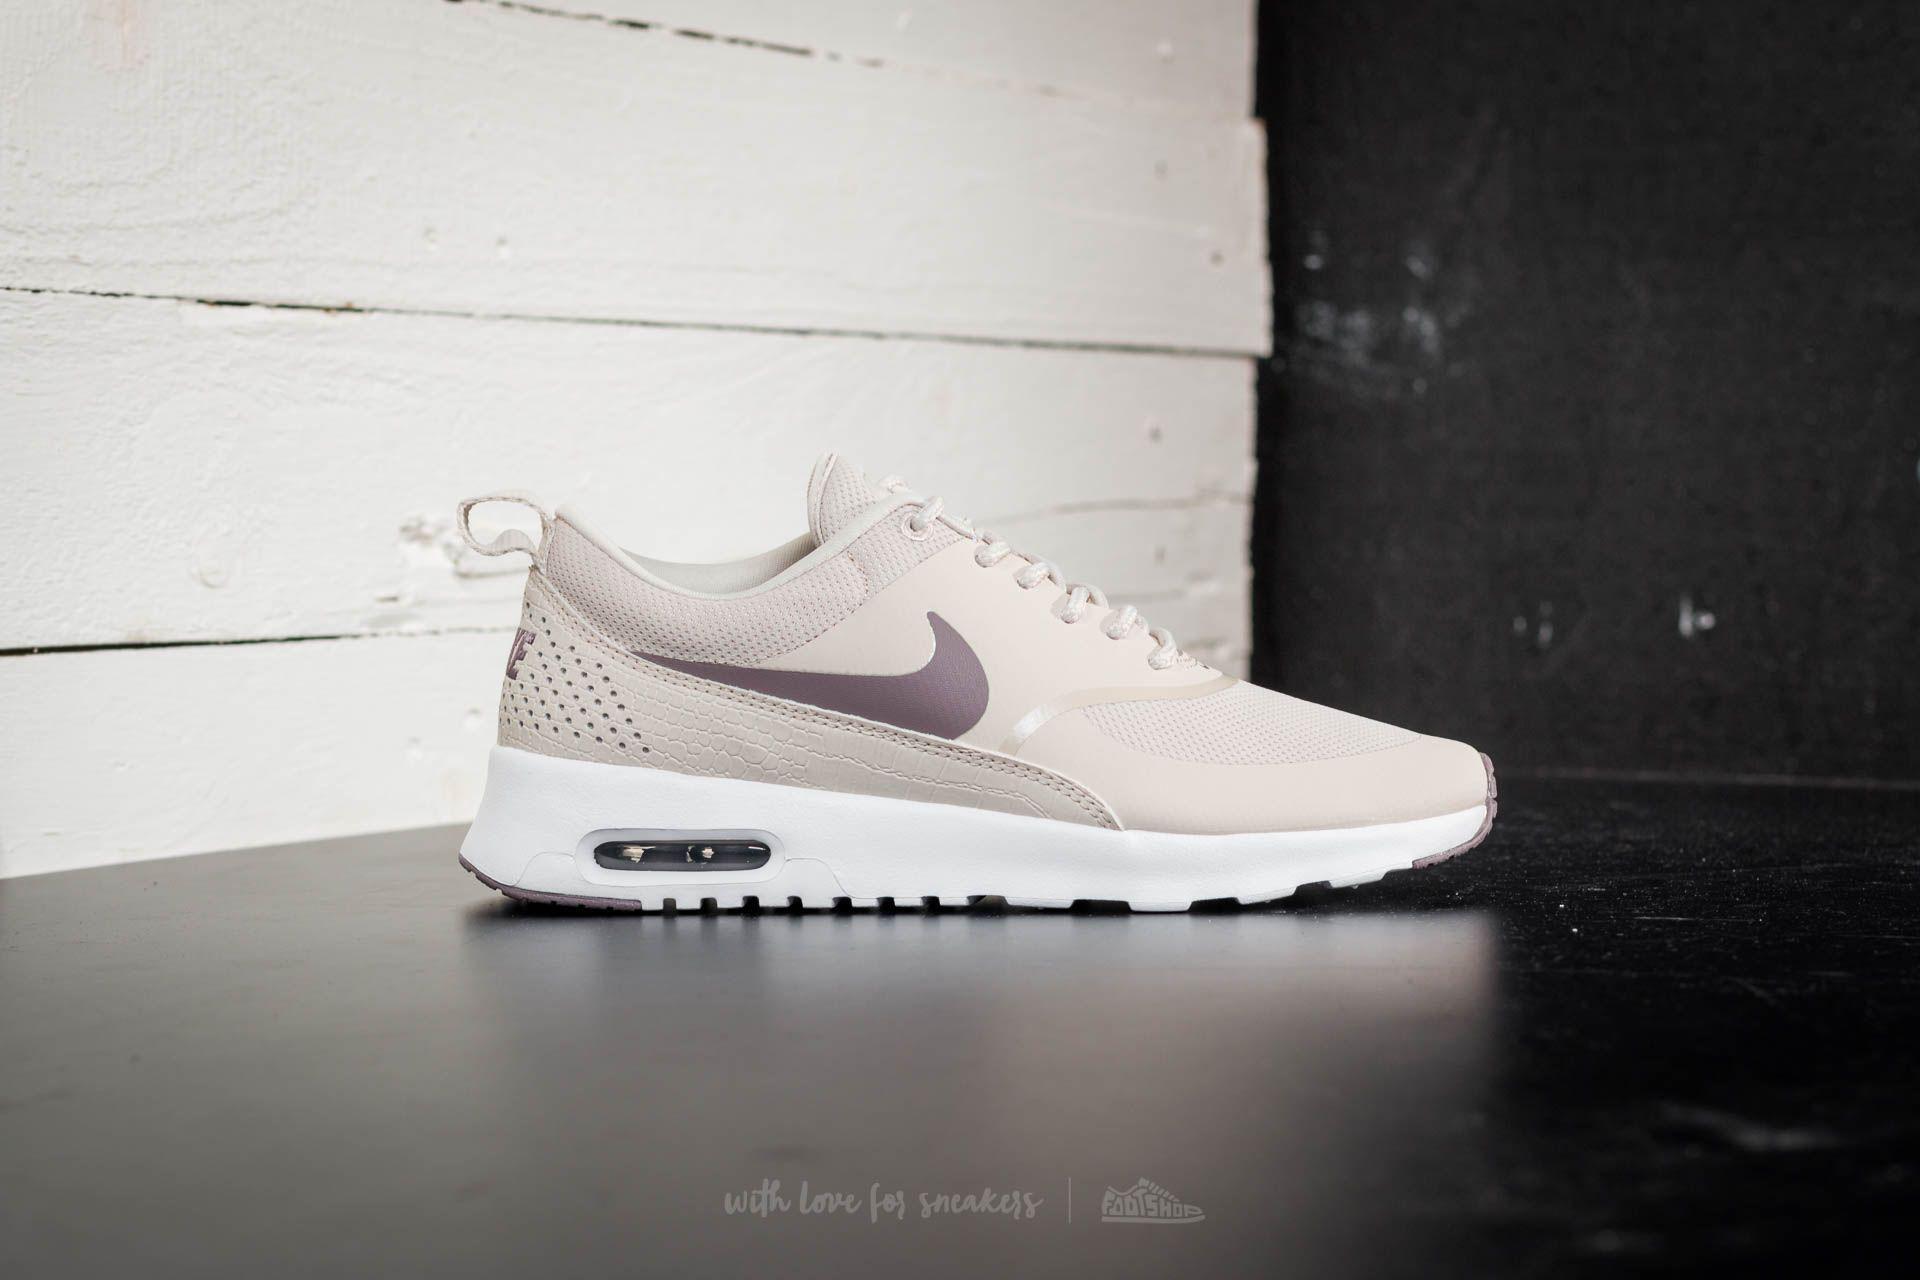 Nike Air Max Thea Women light orewood browntaupe grey ab